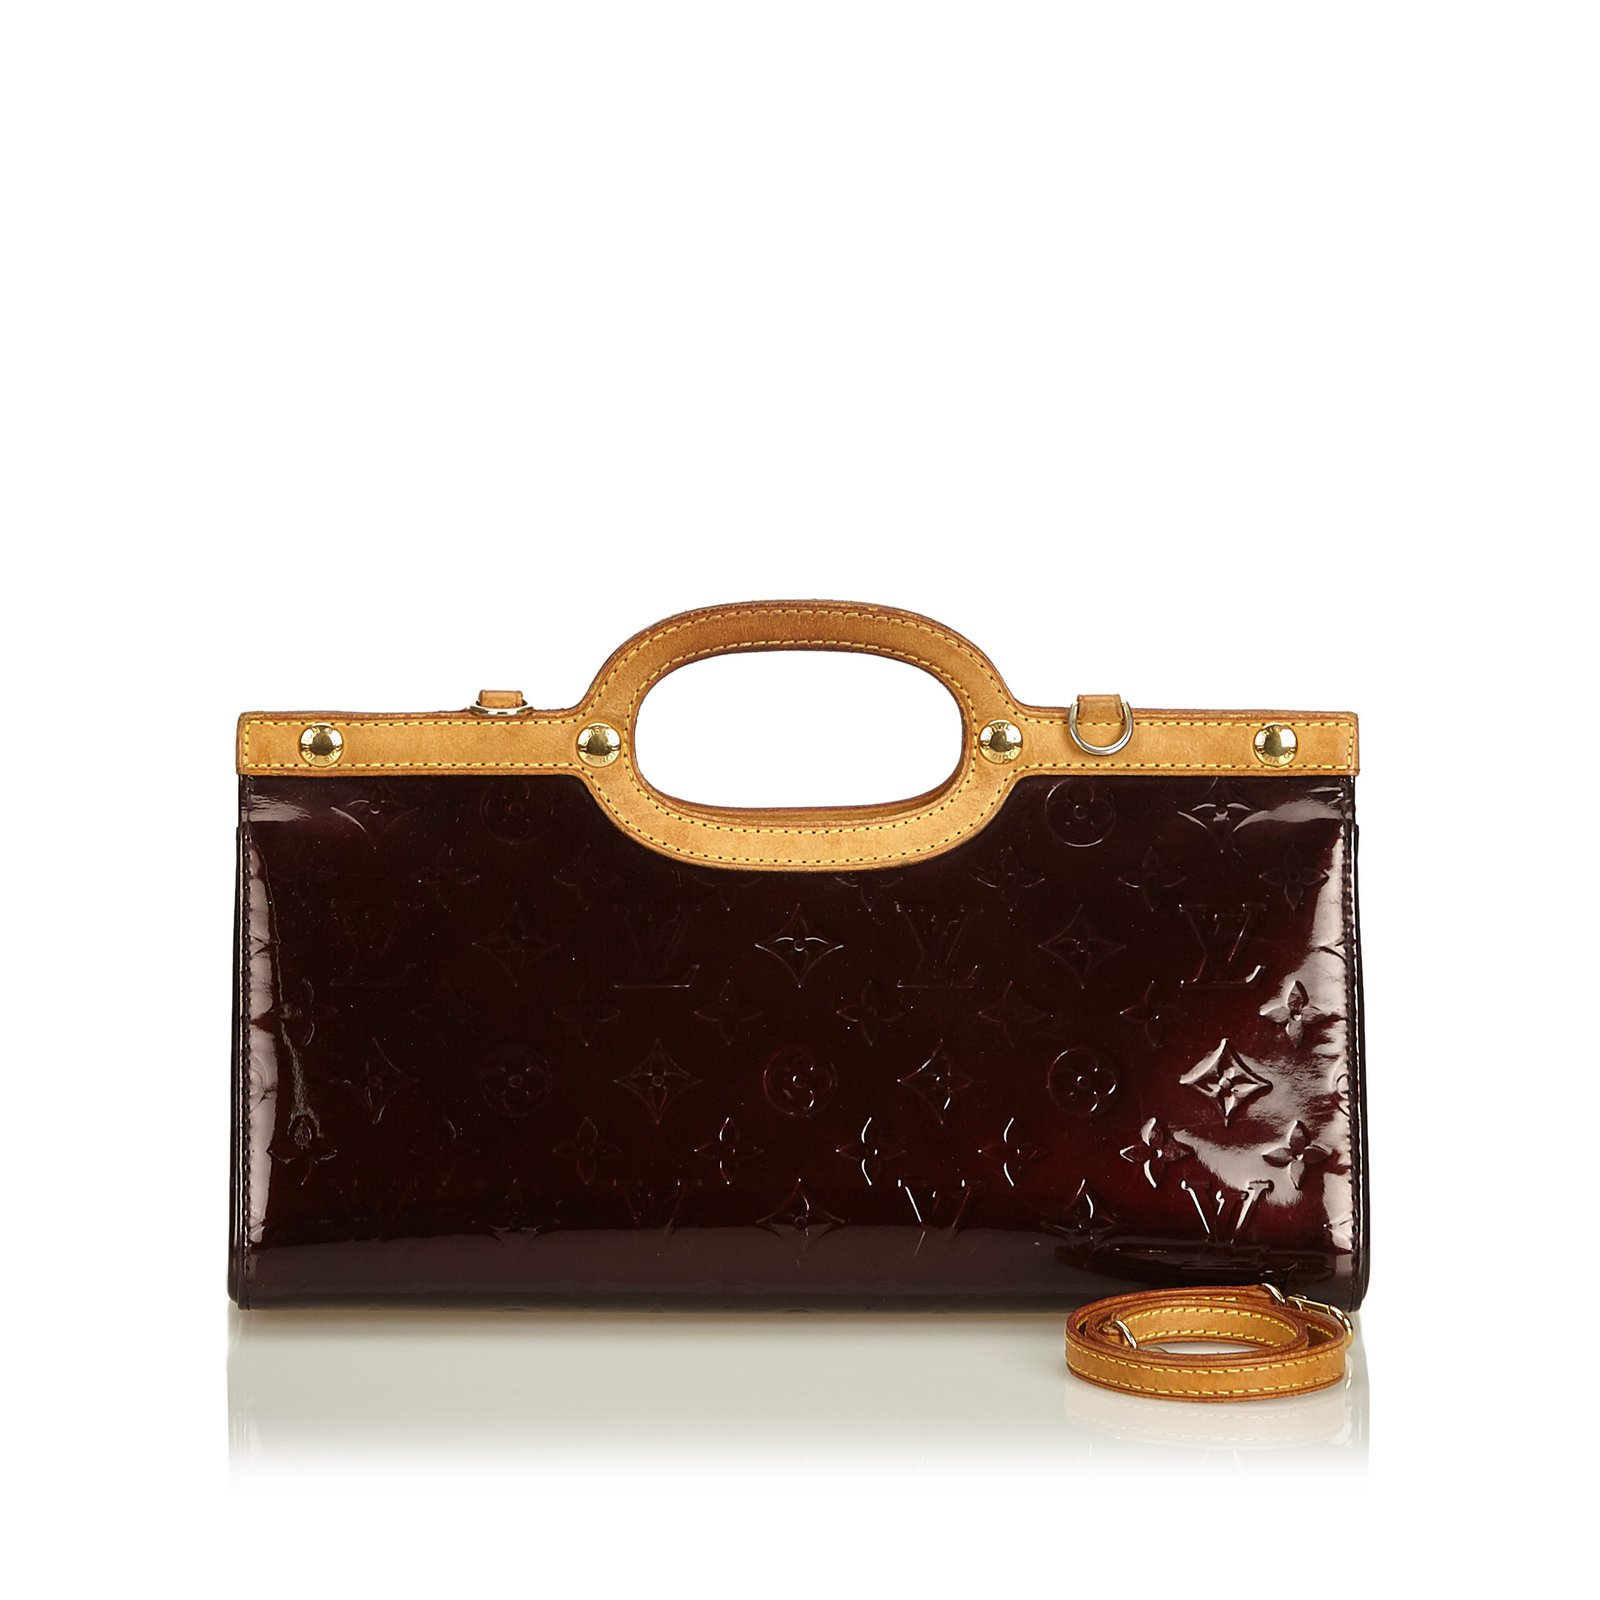 Louis Vuitton Vernis Roxbury Drive Handbags Leather Patent Purple Ref 89758